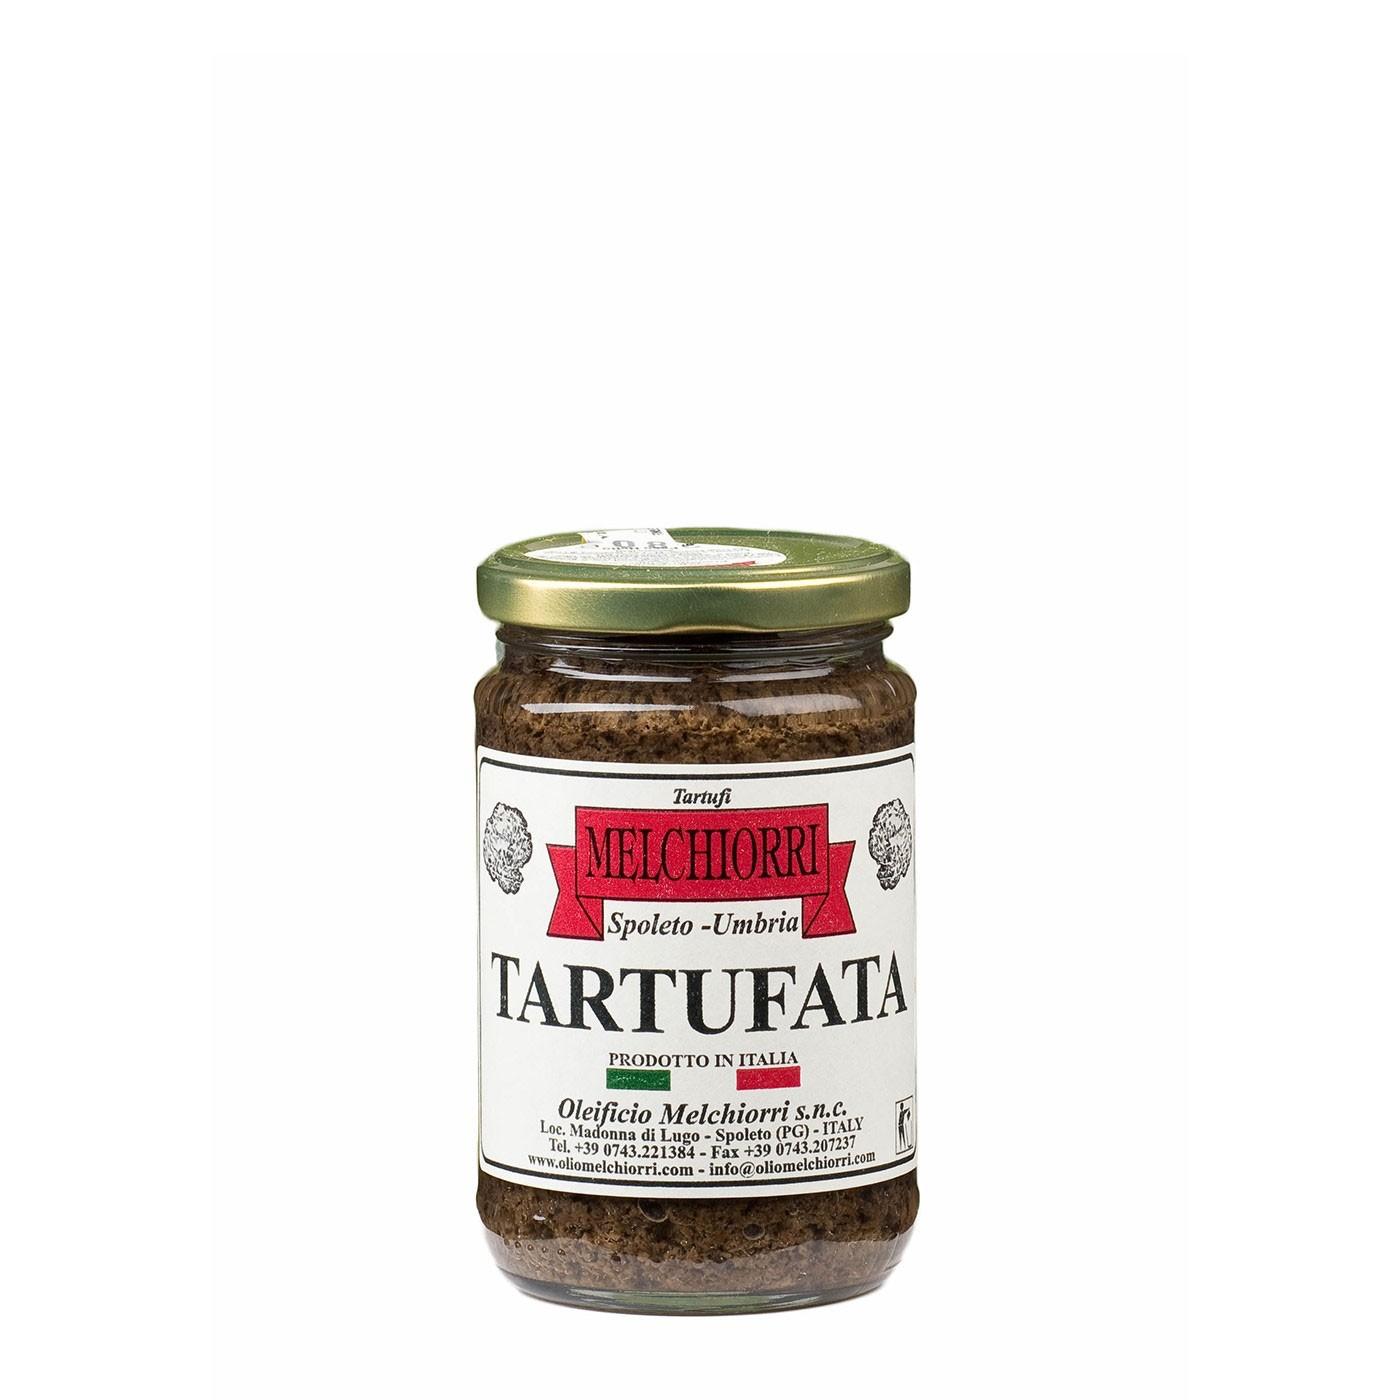 Black Tartufata Truffle Sauce 6.35 oz